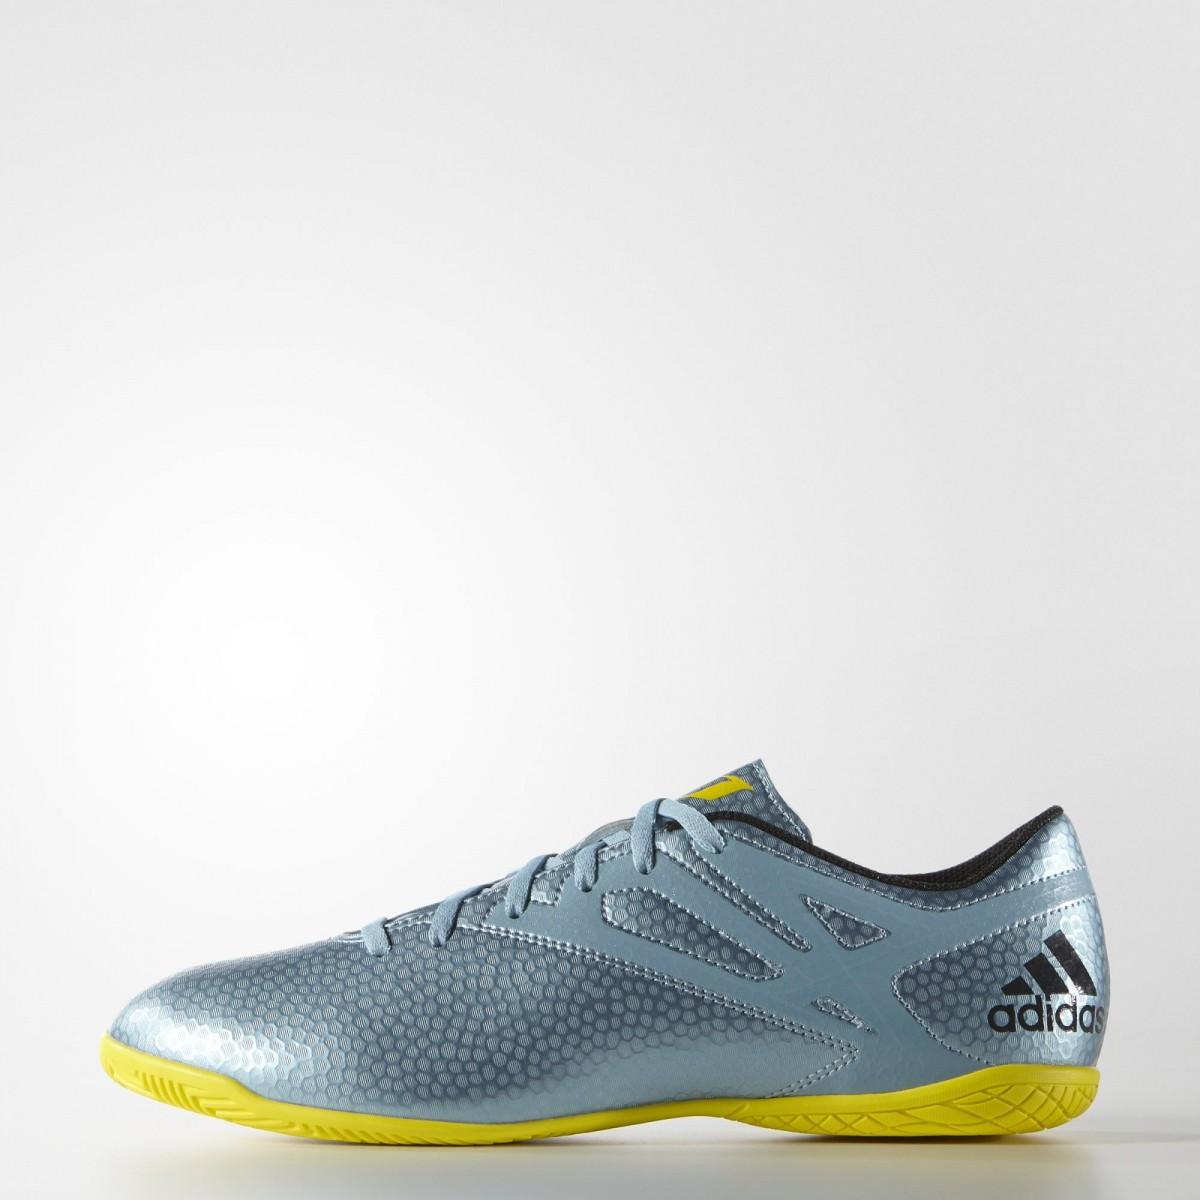 515ab9be1b928 Bizz Store - Chuteira Futsal Adidas Messi 15.4 IN Azul/Verde